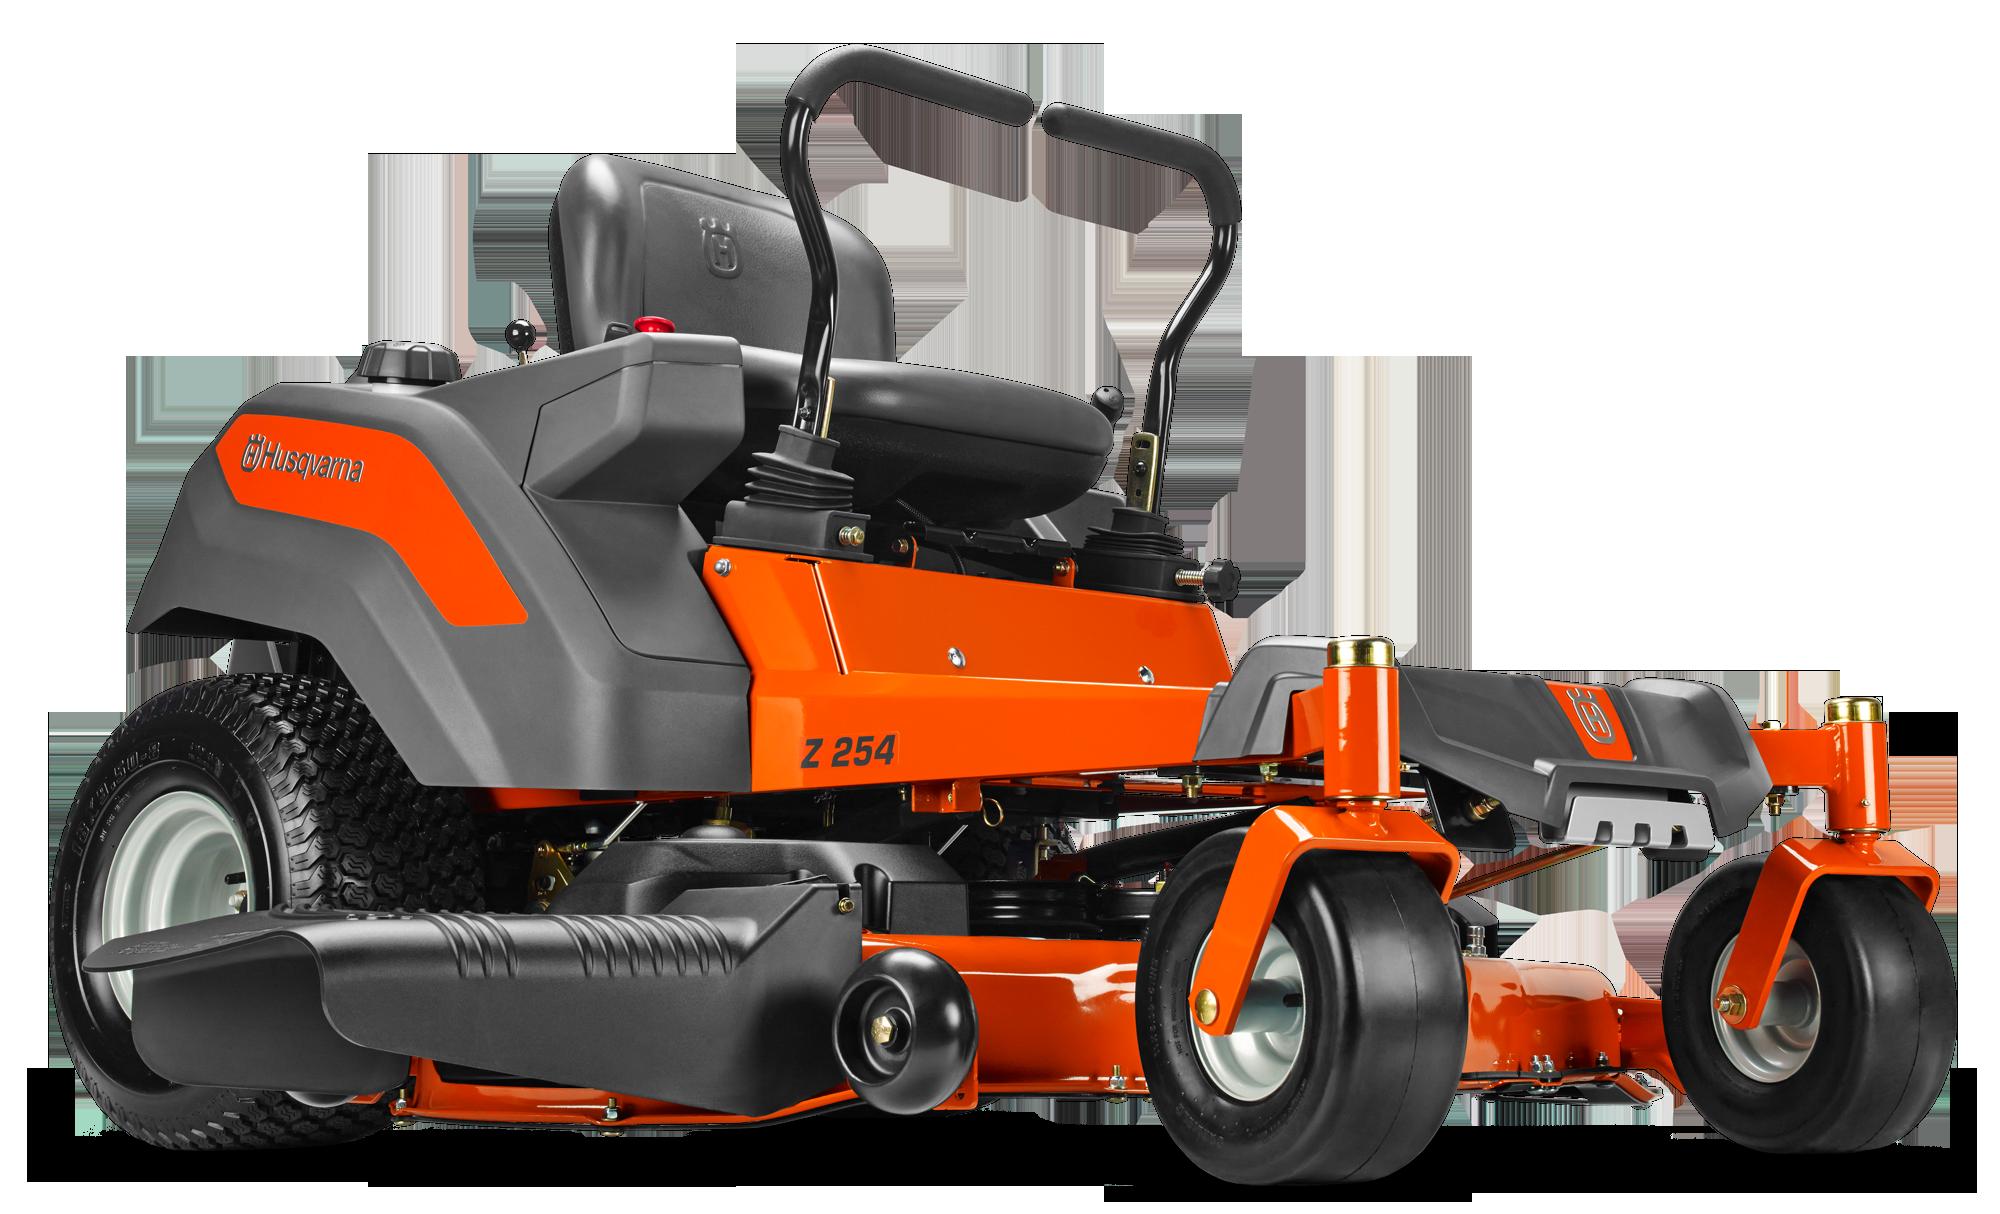 Husqvarna Zero Turn Mowers Z254i Zero Turn Lawn Mowers Best Riding Lawn Mower Best Zero Turn Mower